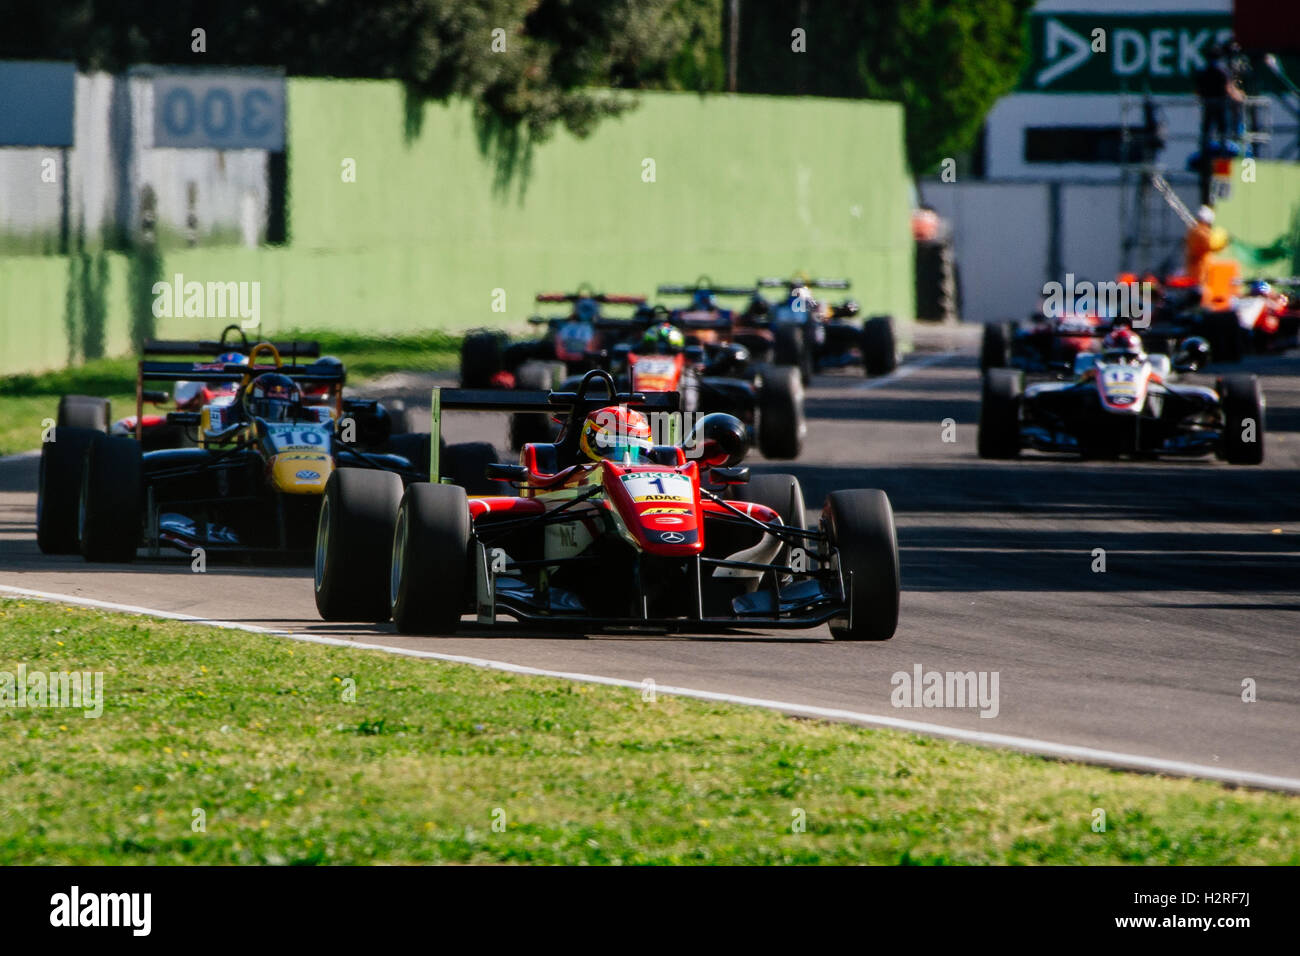 Imola Italy 01st Oct 2016 Prema Powerteam S Driver Lance Stroll Stock Photo Alamy